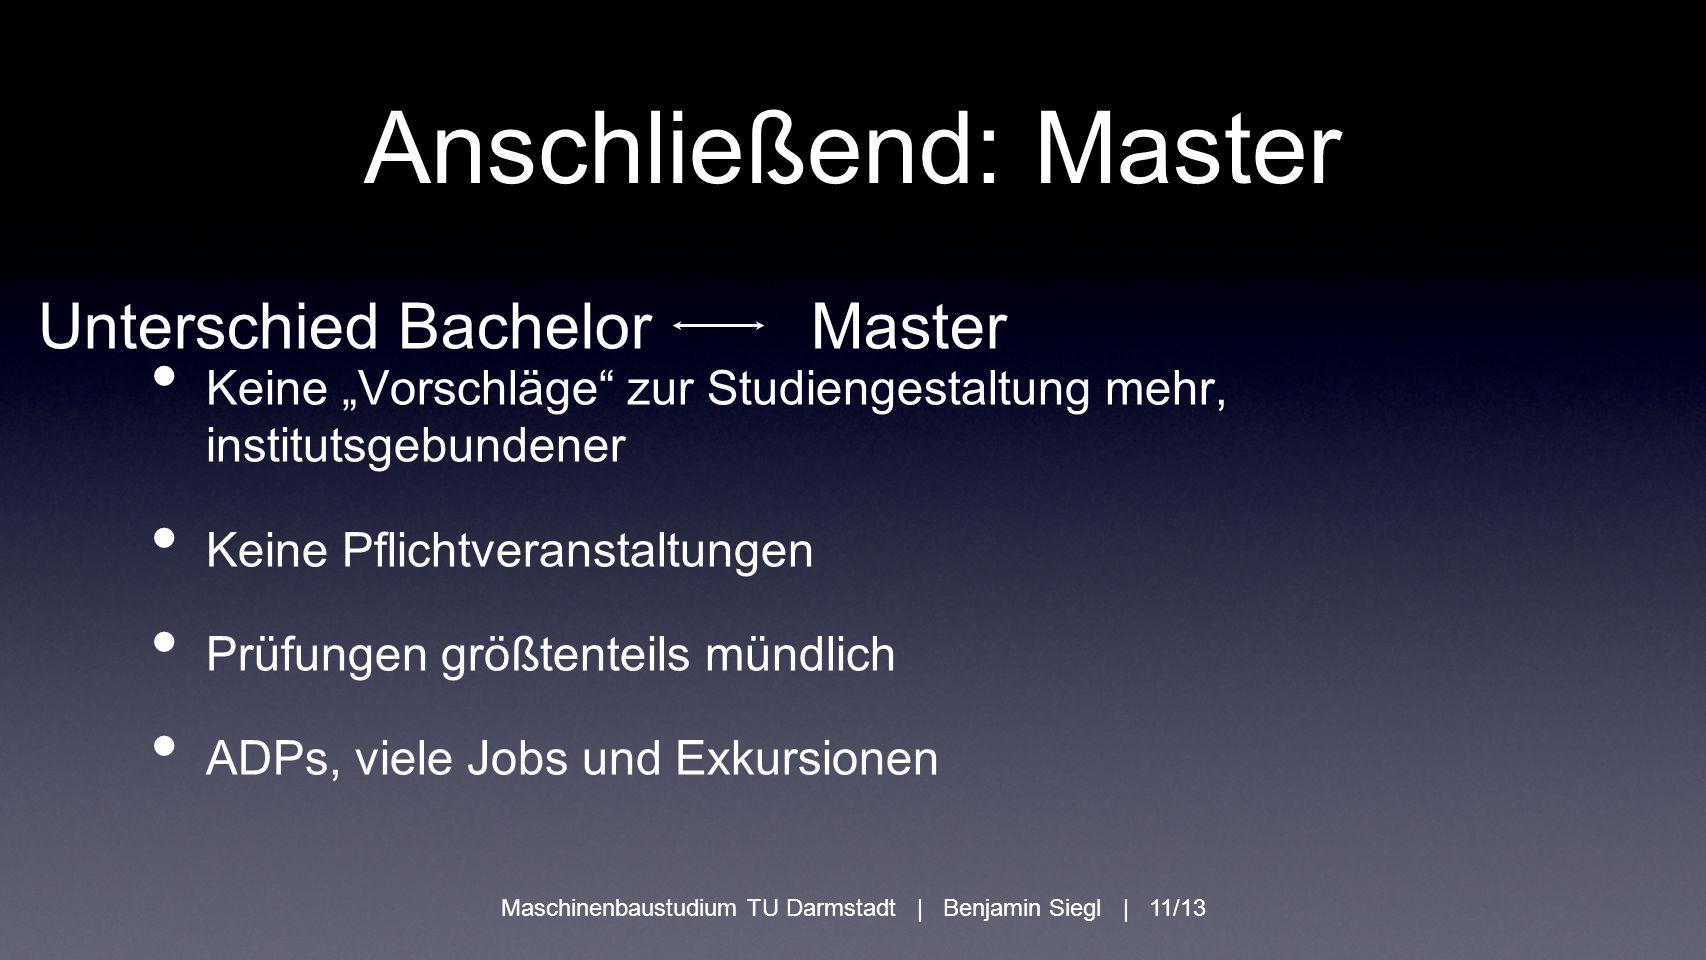 Anschließend: Master Unterschied Bachelor Master